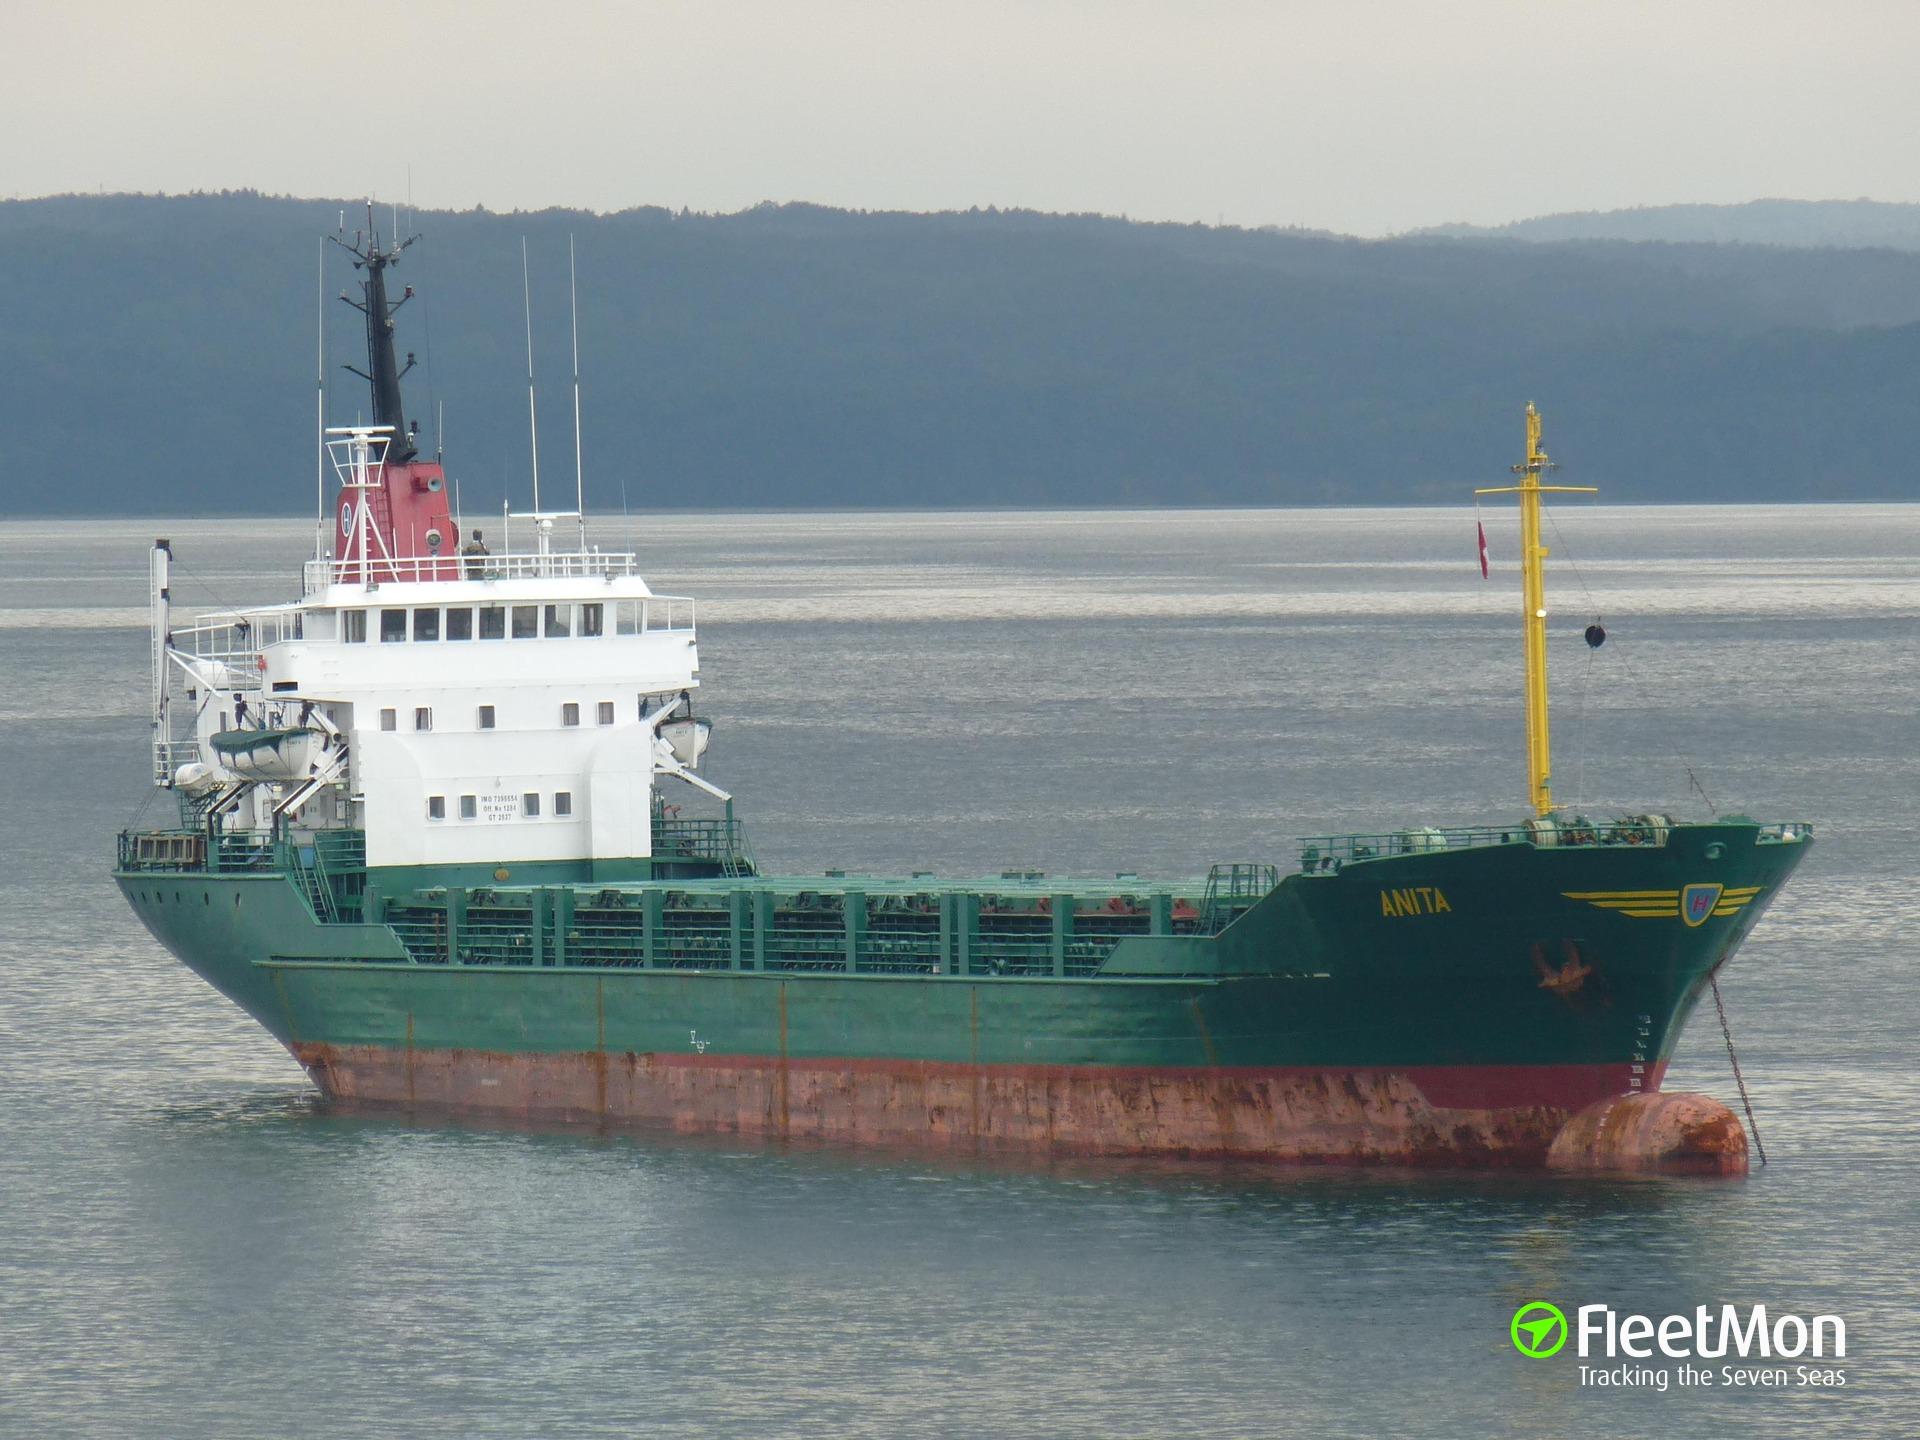 Freighter Captain Omar suffered engine failure in Bosphorus